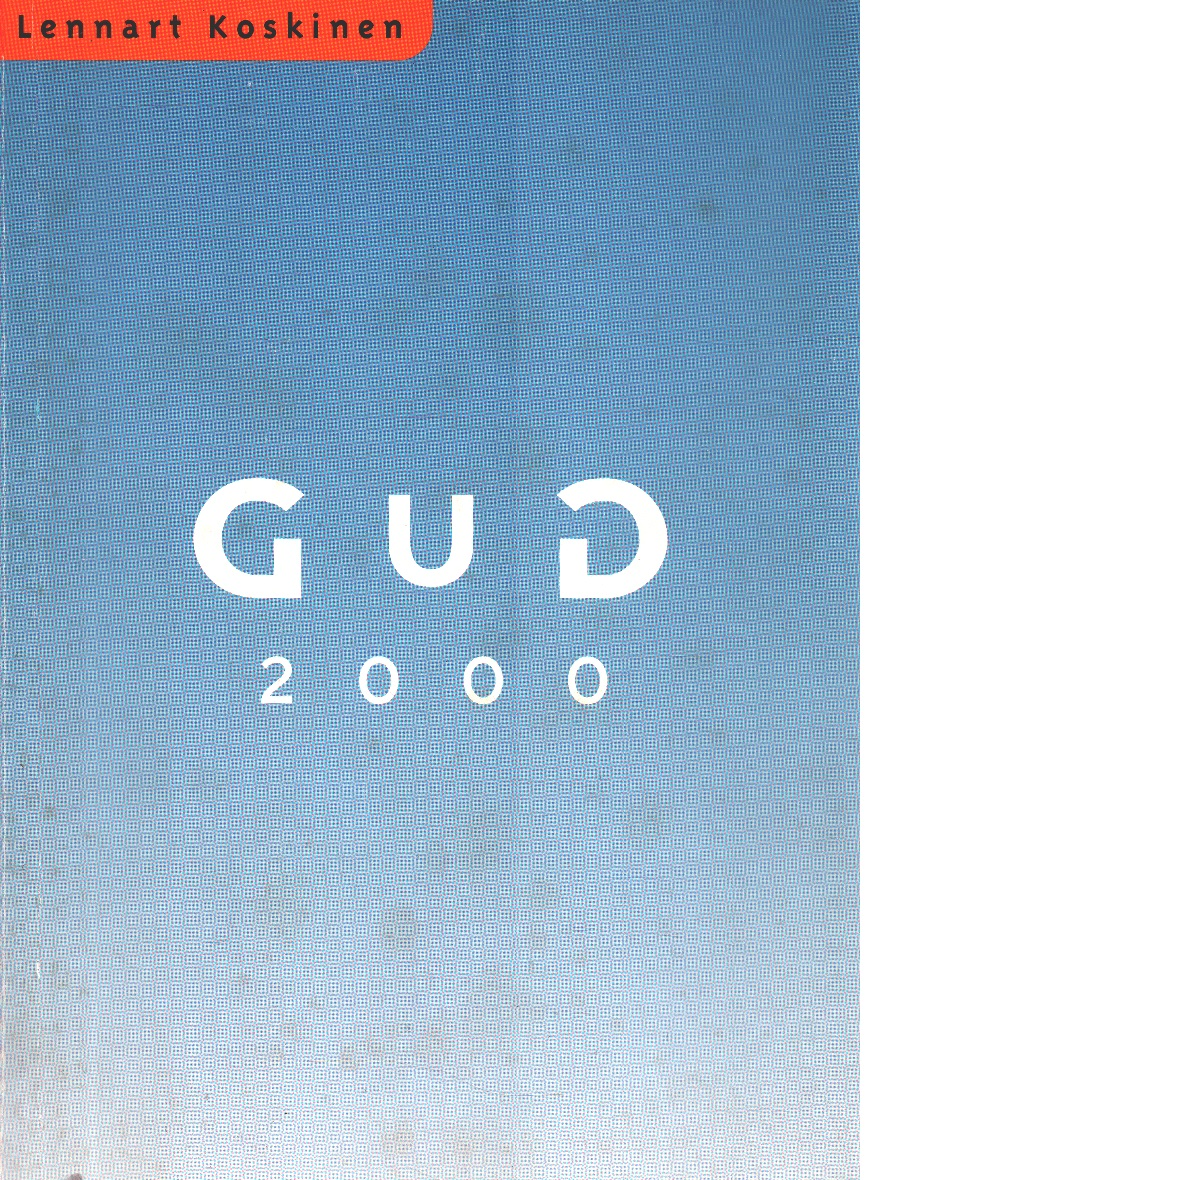 Gud 2000 - Koskinen, Lennart